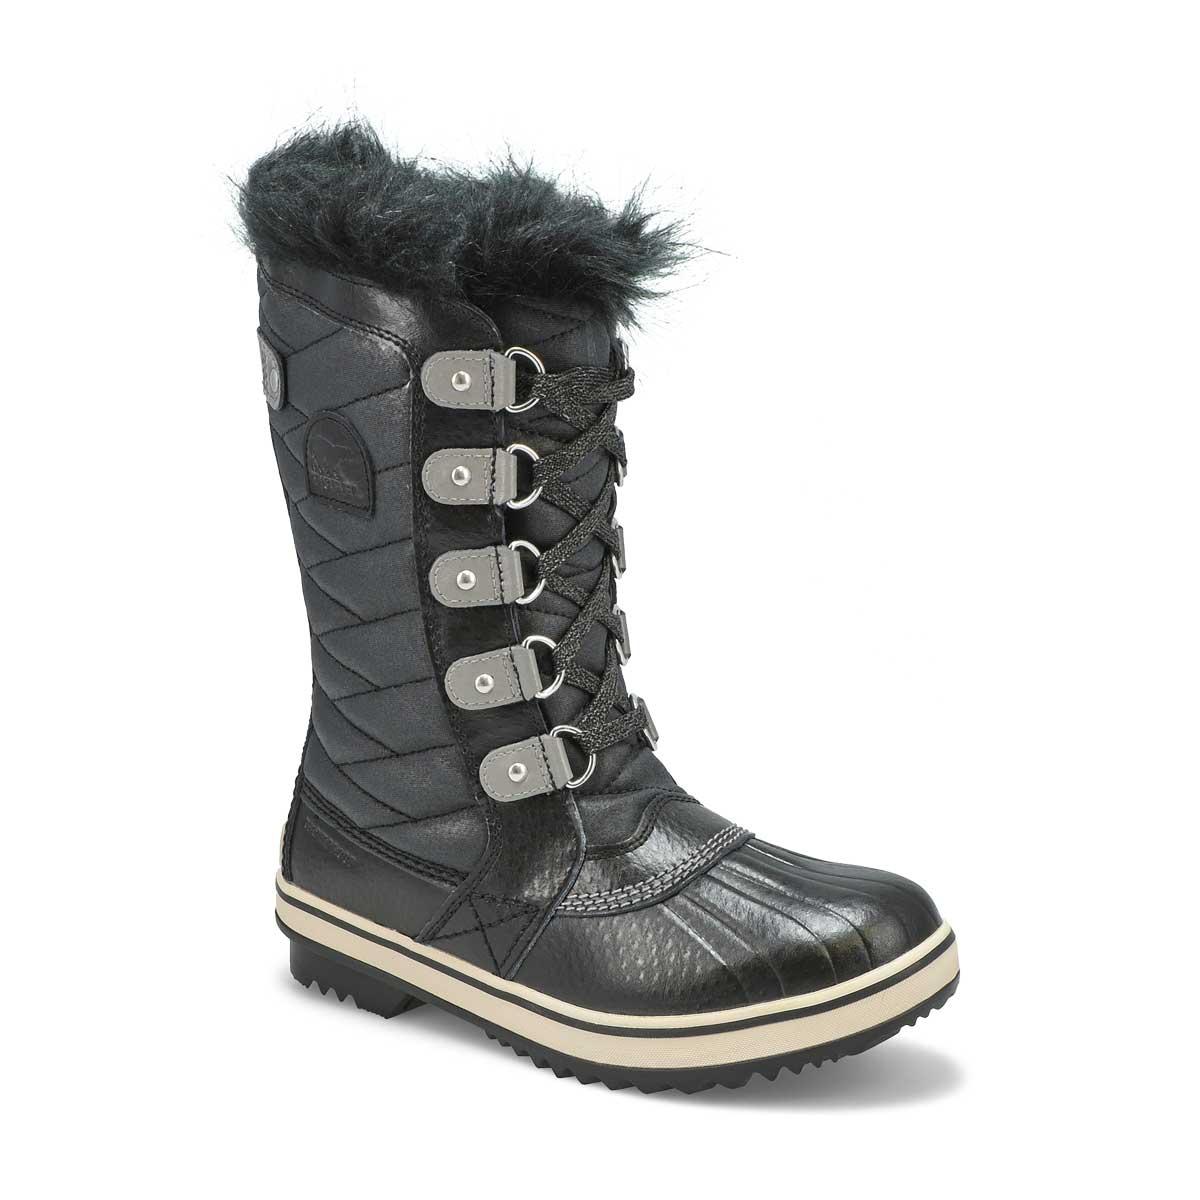 Girls' TOFINO II black waterproof snow boots